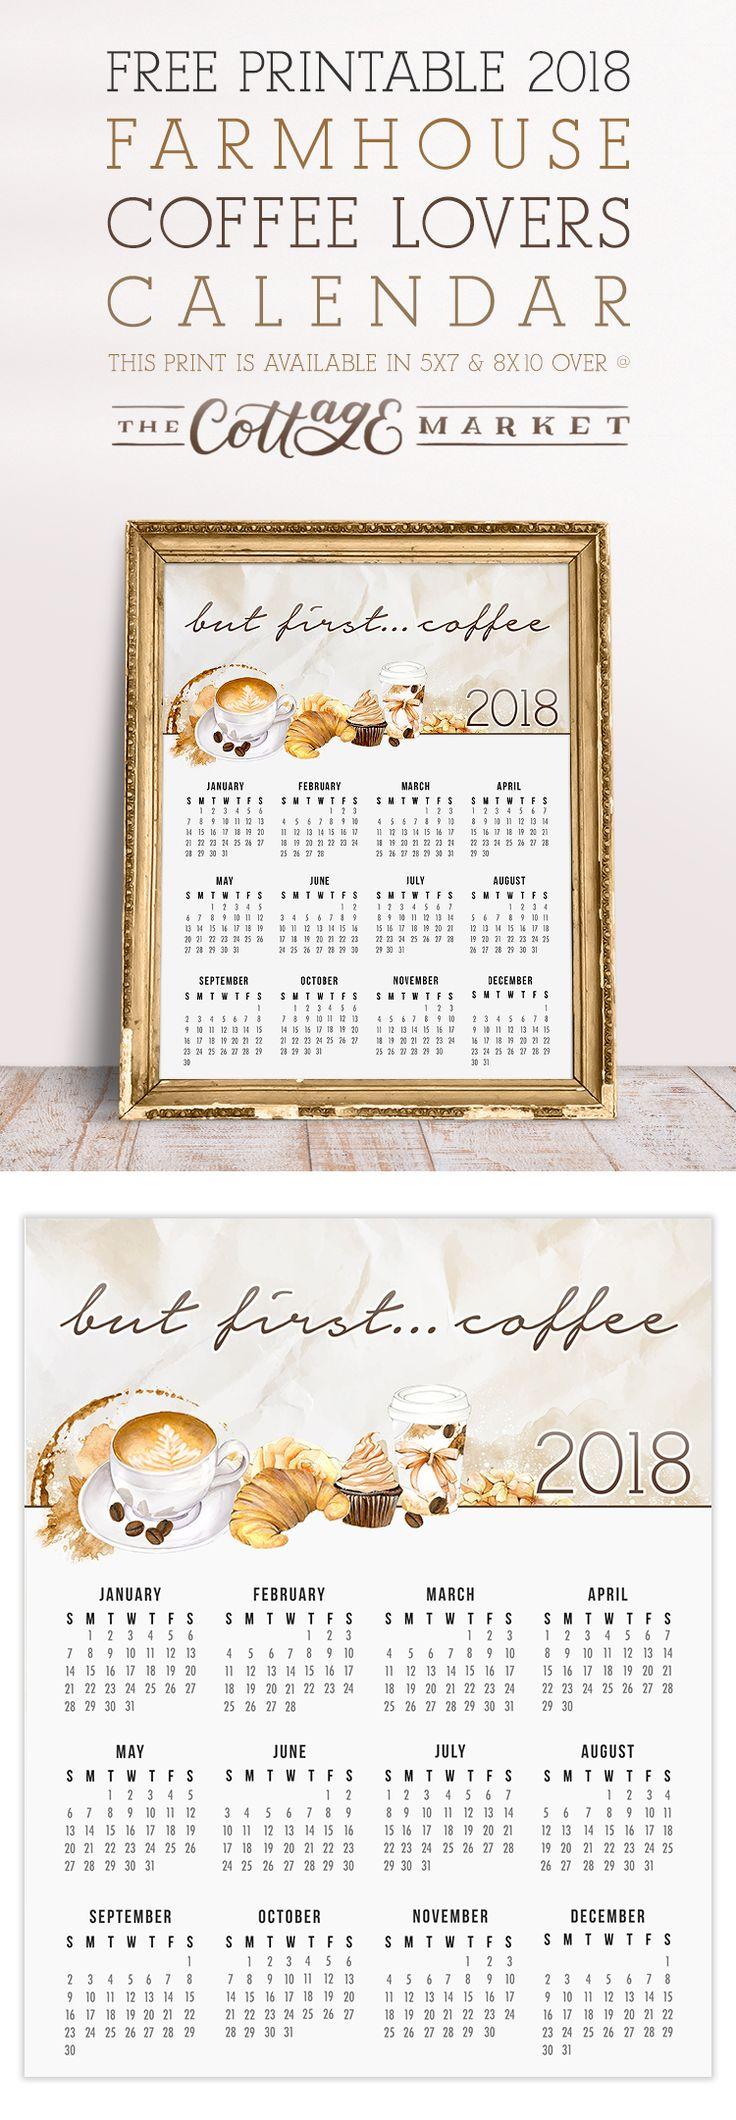 Free Printable 2018 Farmhouse Coffee Lovers Calendar